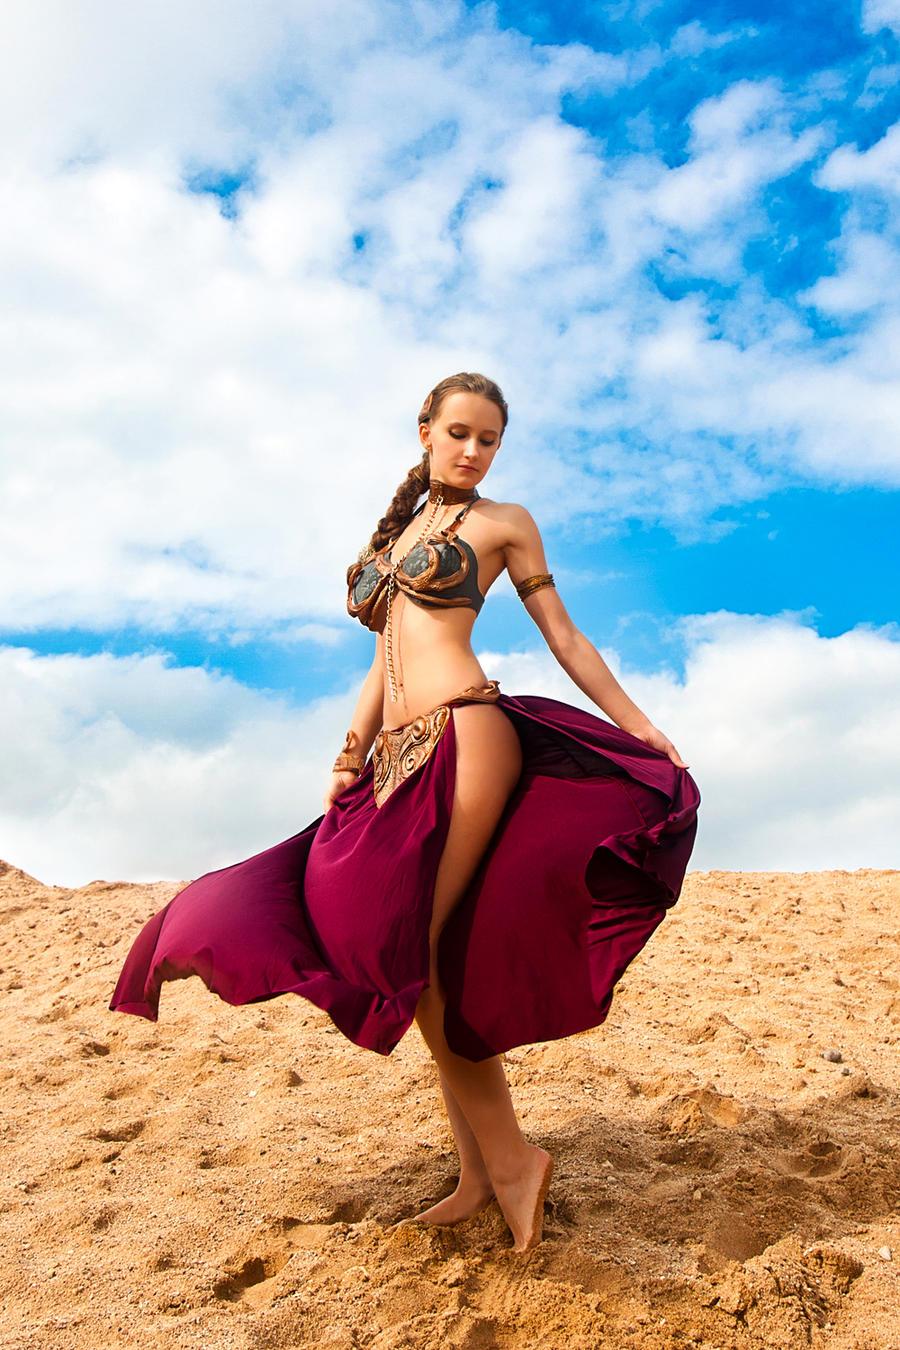 Star Wars - Leia by diacita